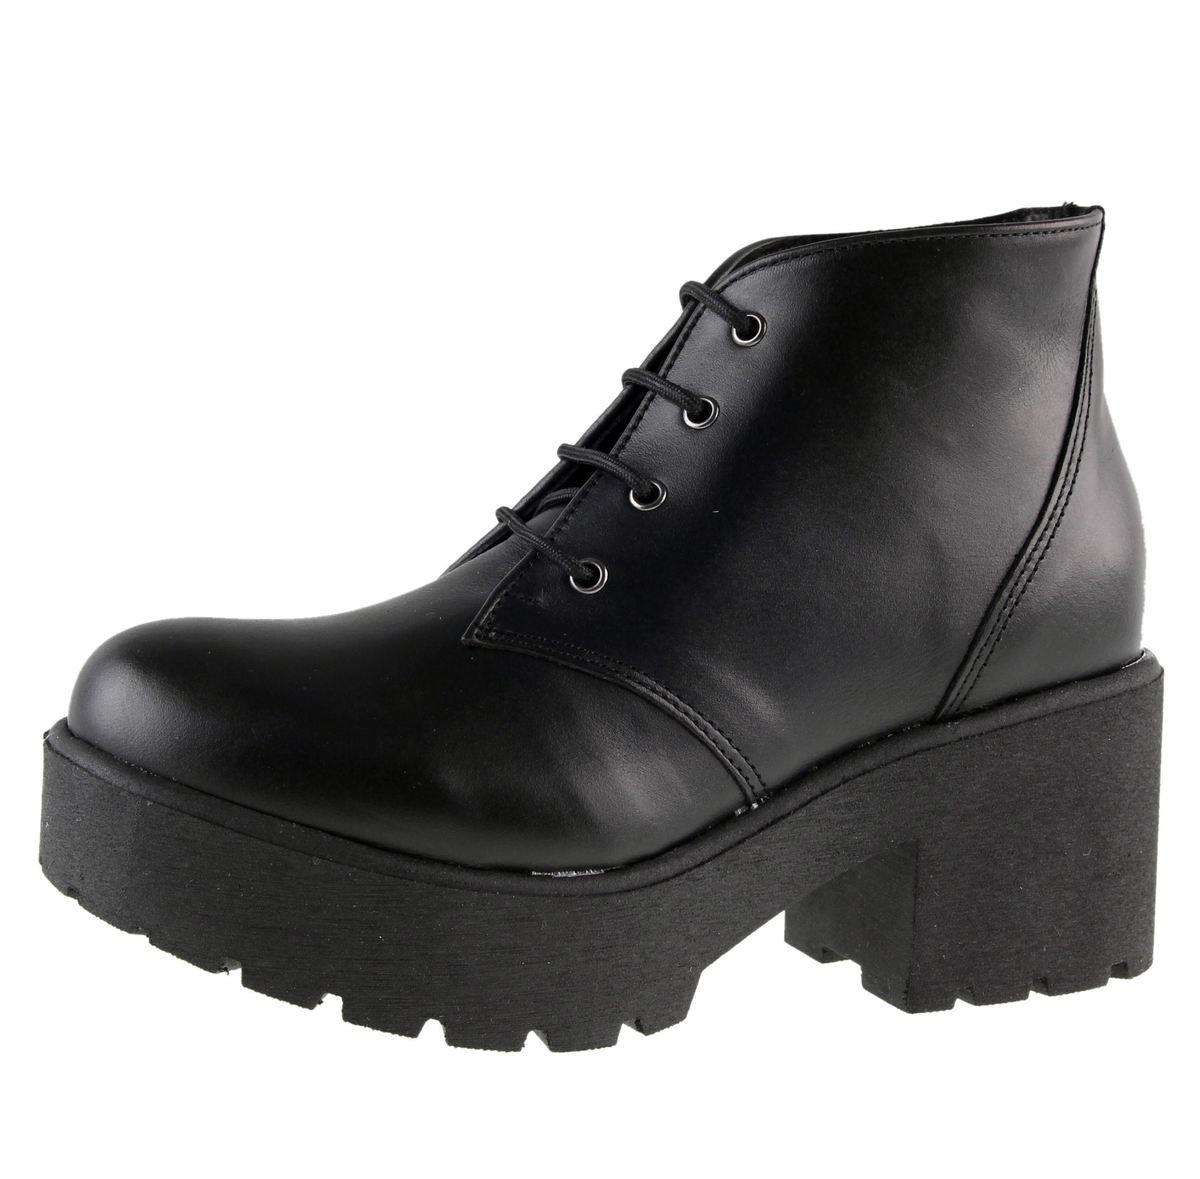 boty dámské ALTERCORE - Nero - Black